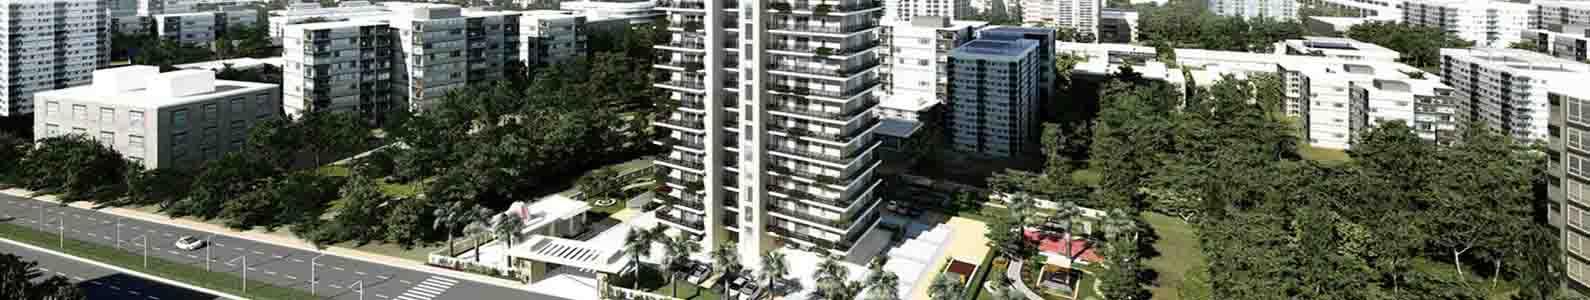 http://www.getsellproperty.com/builder/amr/krishna-apartment/header.jpg